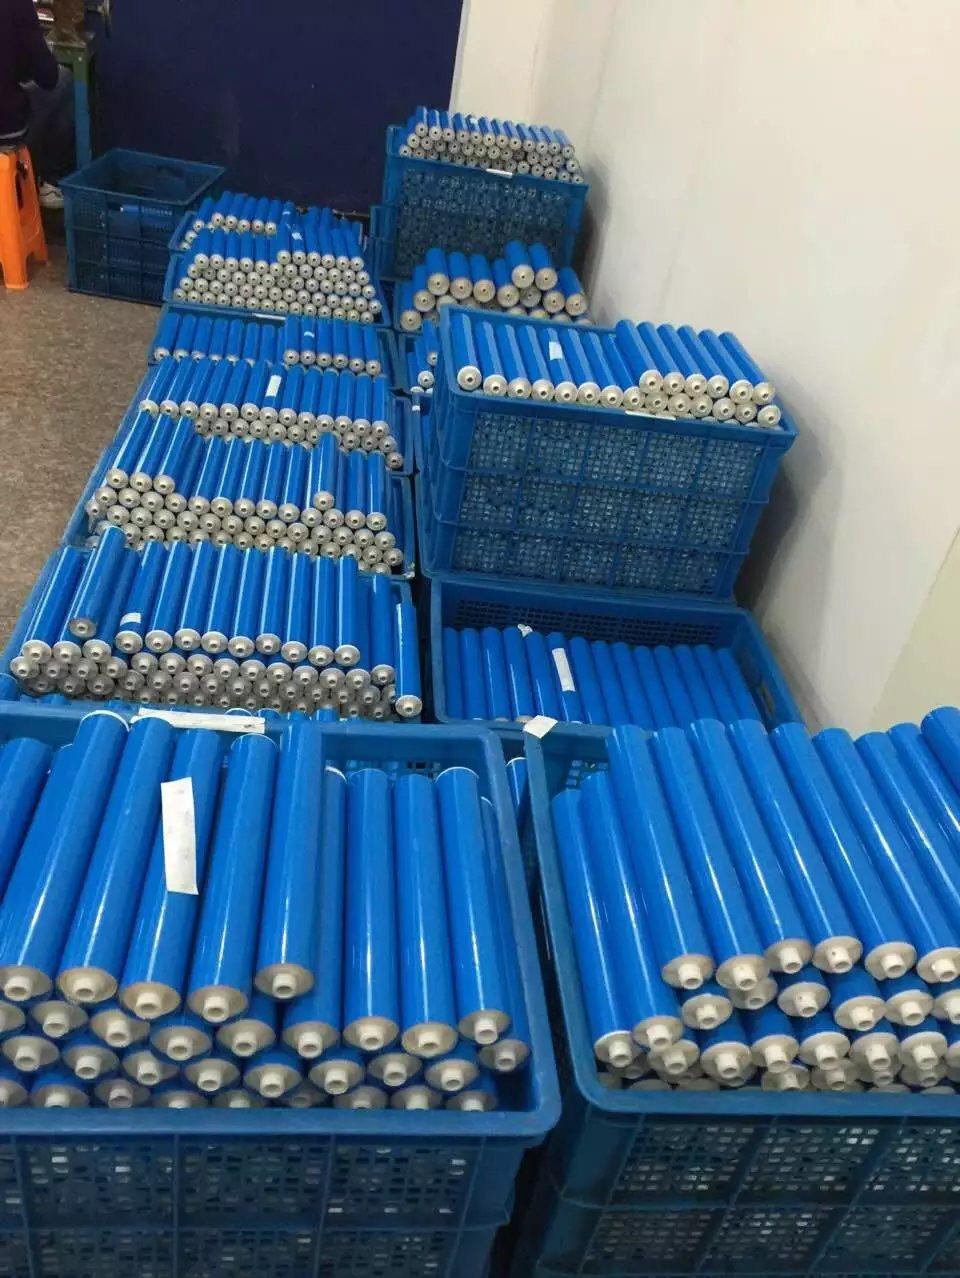 Supplier of Vontron 75gpd RO Membrane Element